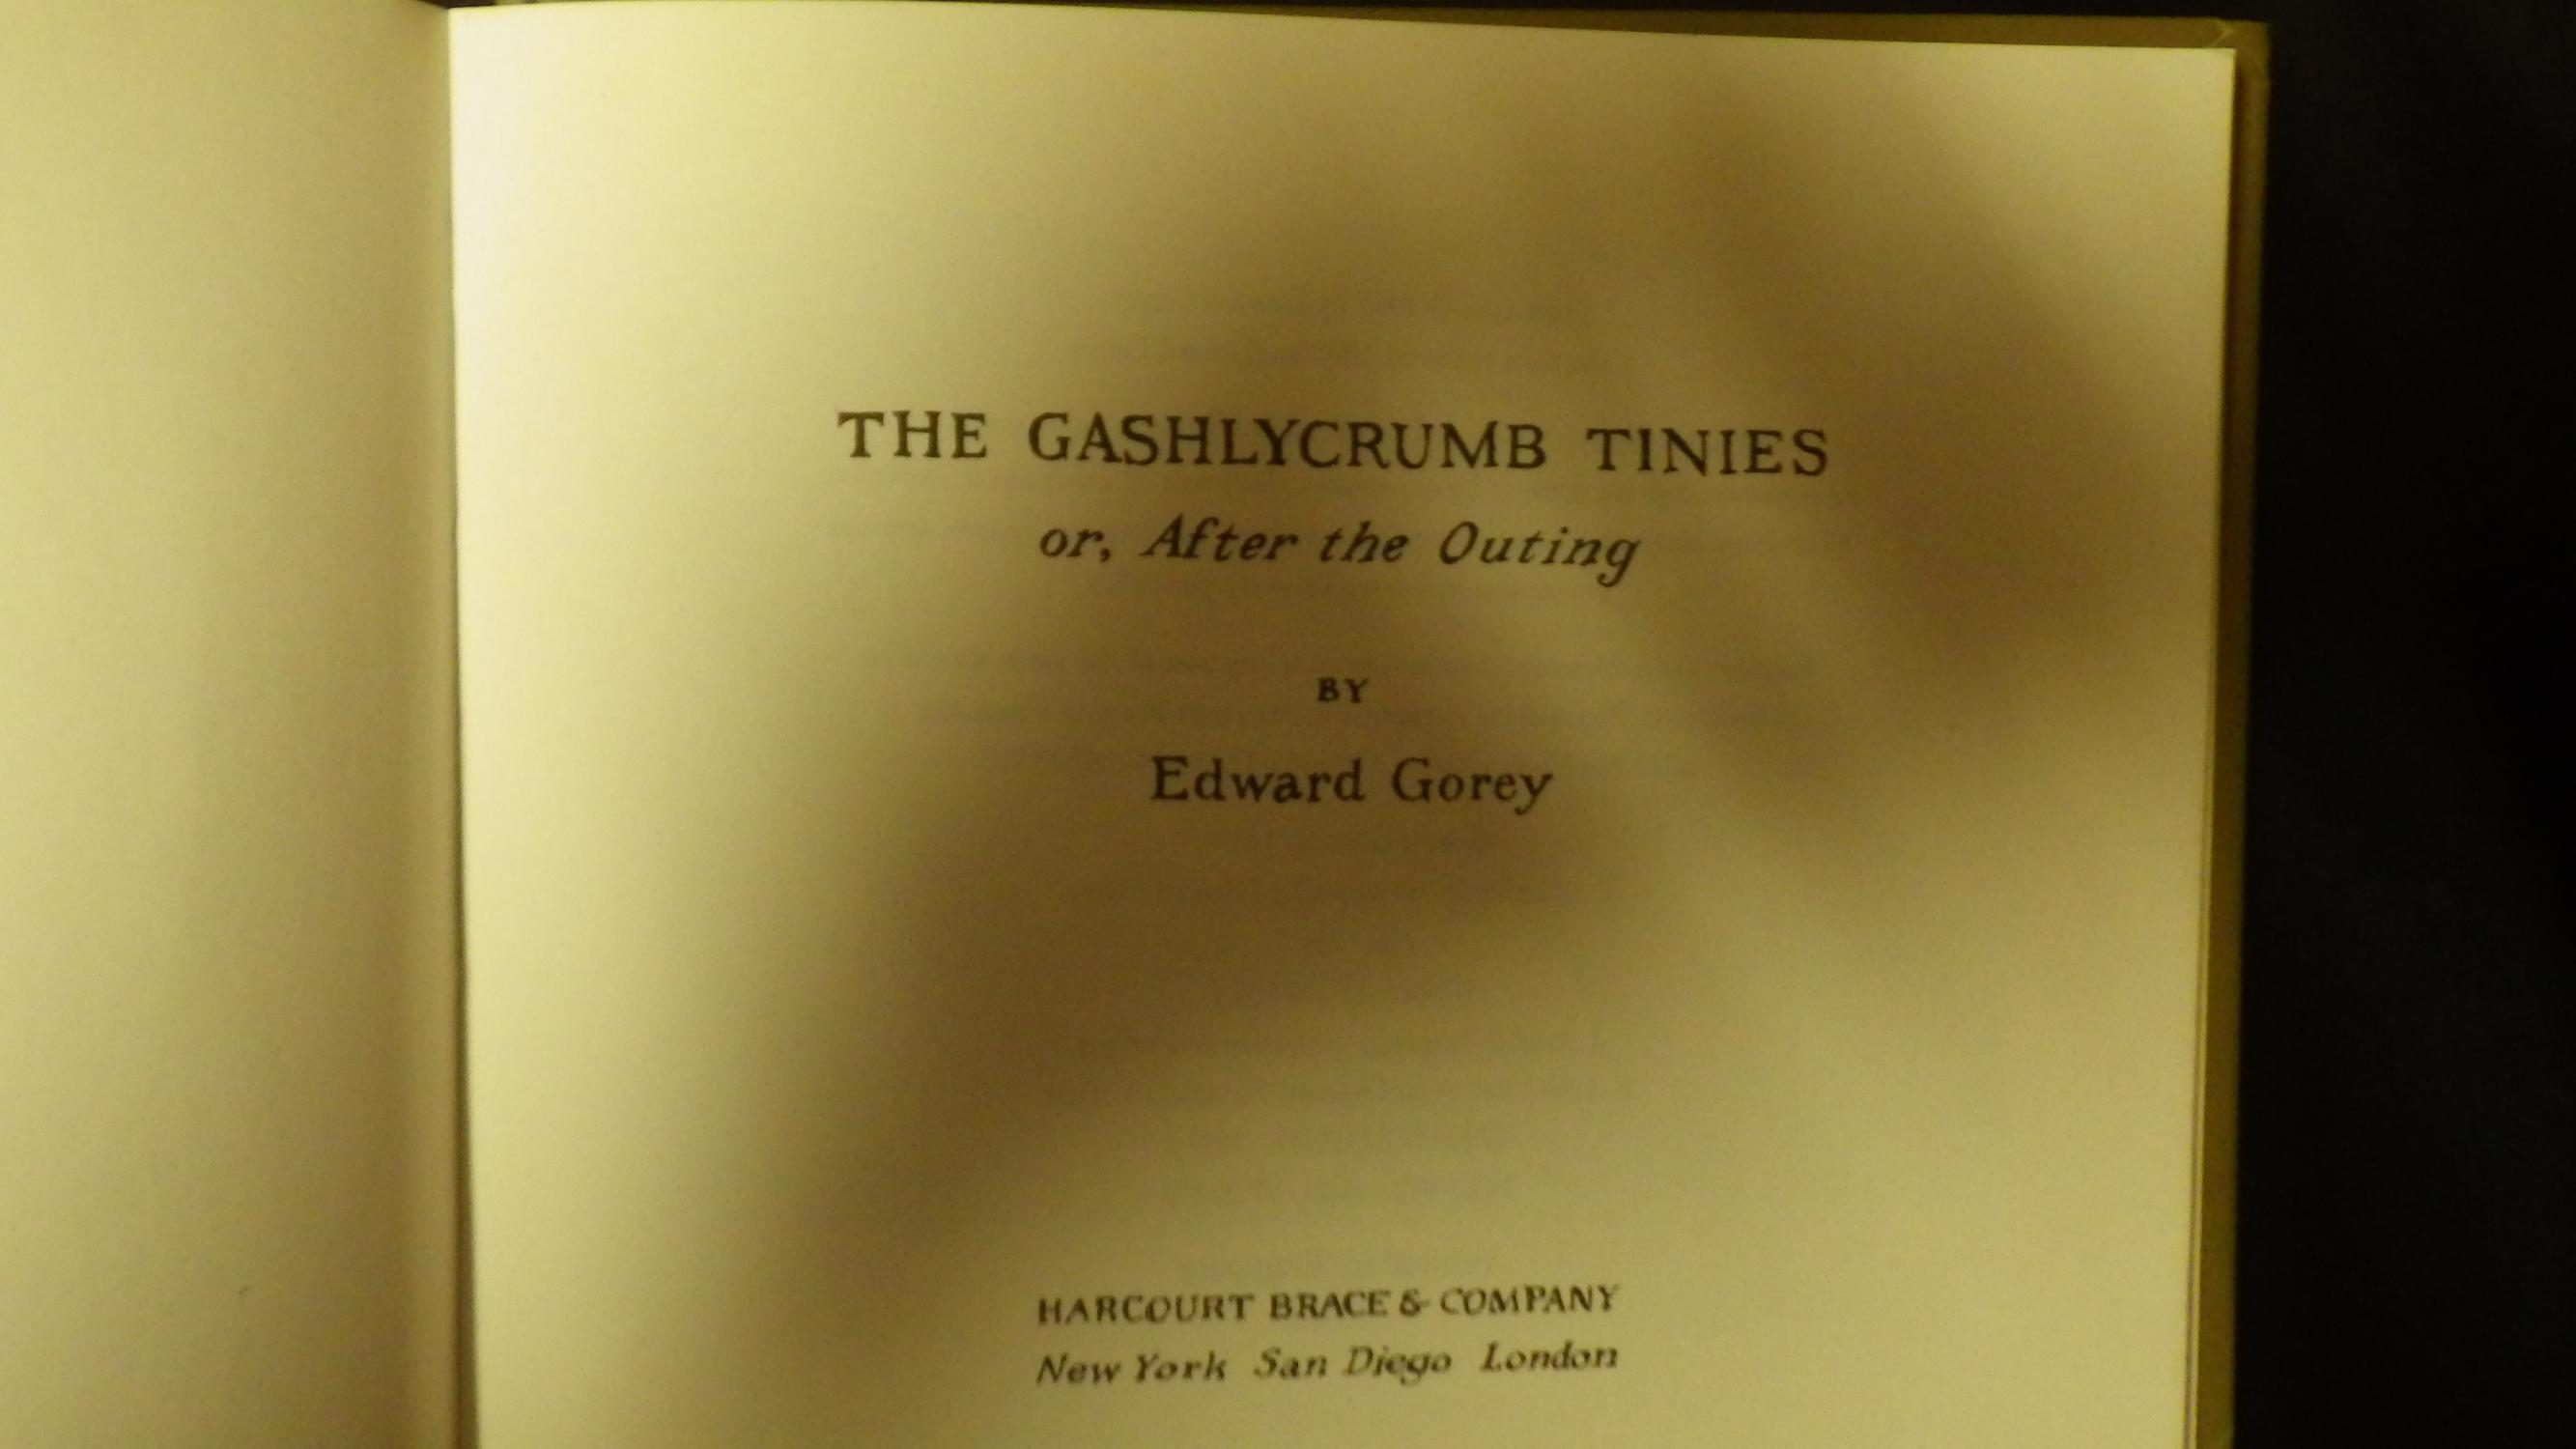 Edward gorey gashlycrumb tinies online dating